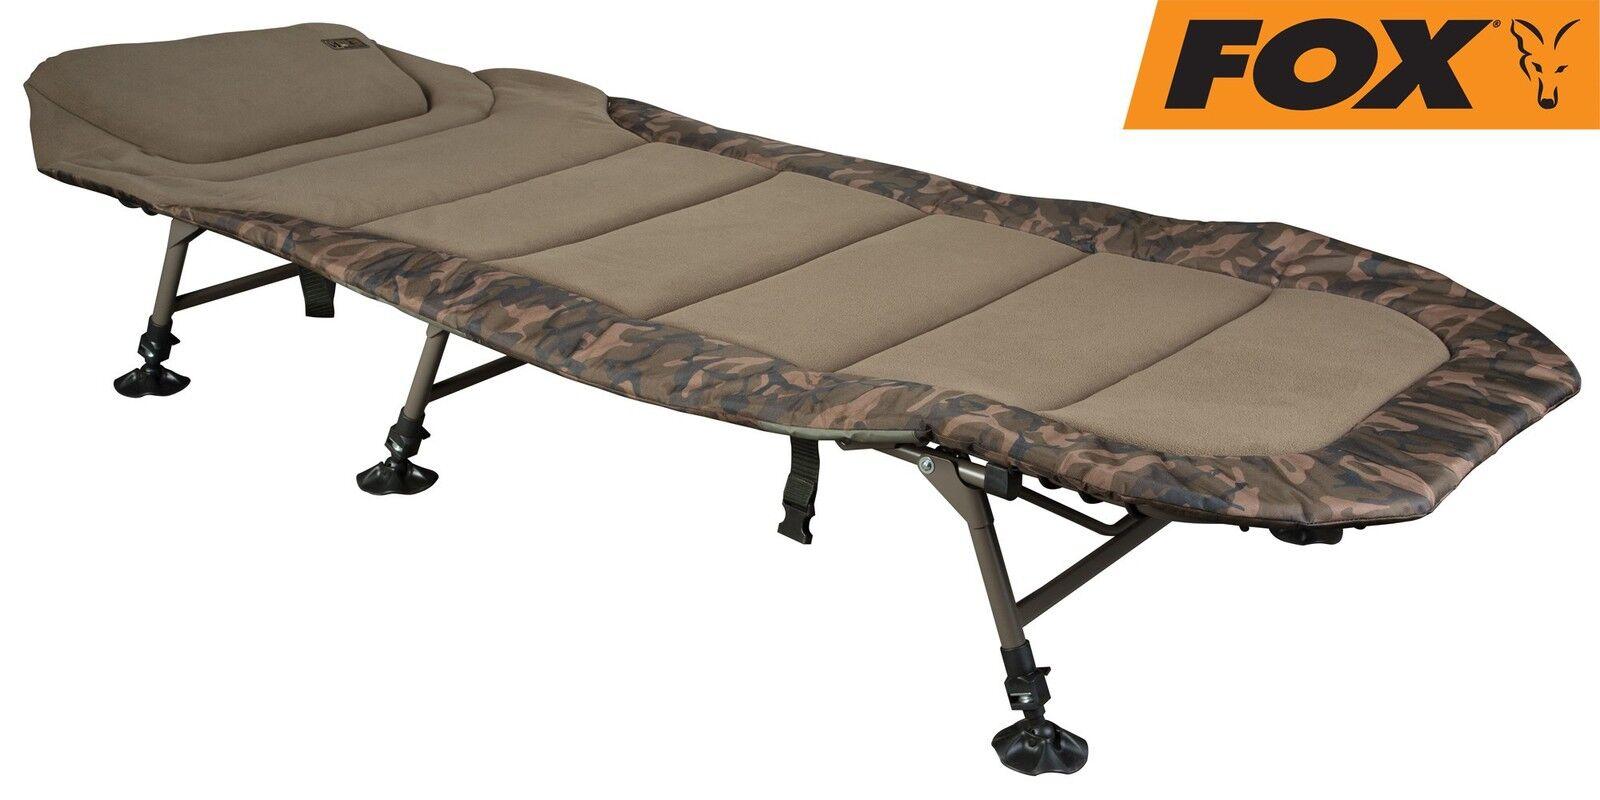 Fox Royale Camo Bedchair XL 223x101cm Karpfenliege, Angelliege Angelliege Angelliege zum Nachtangeln 738778